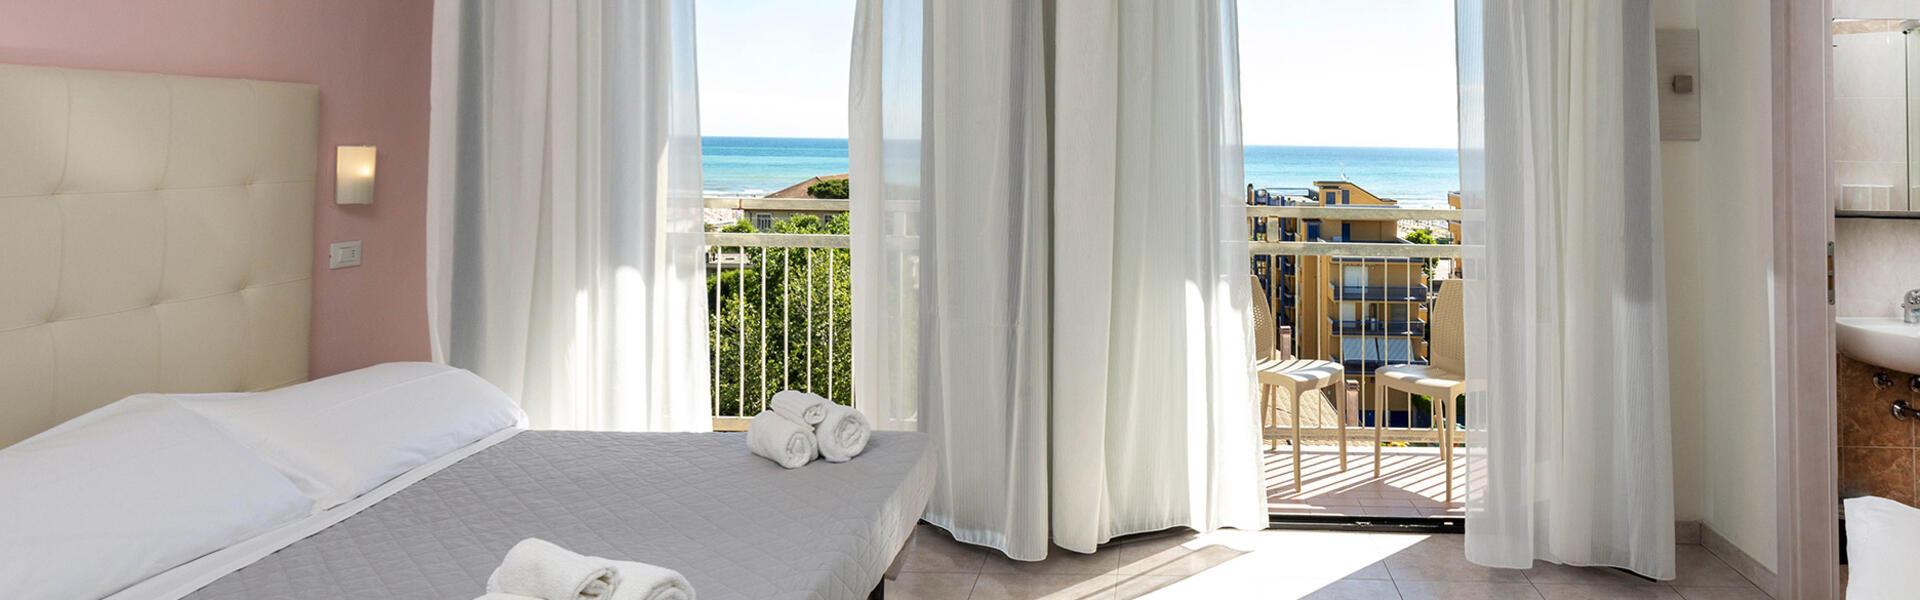 gambrinusrimini en rooms-hotel-all-inclusive-riviera-romagnola 012